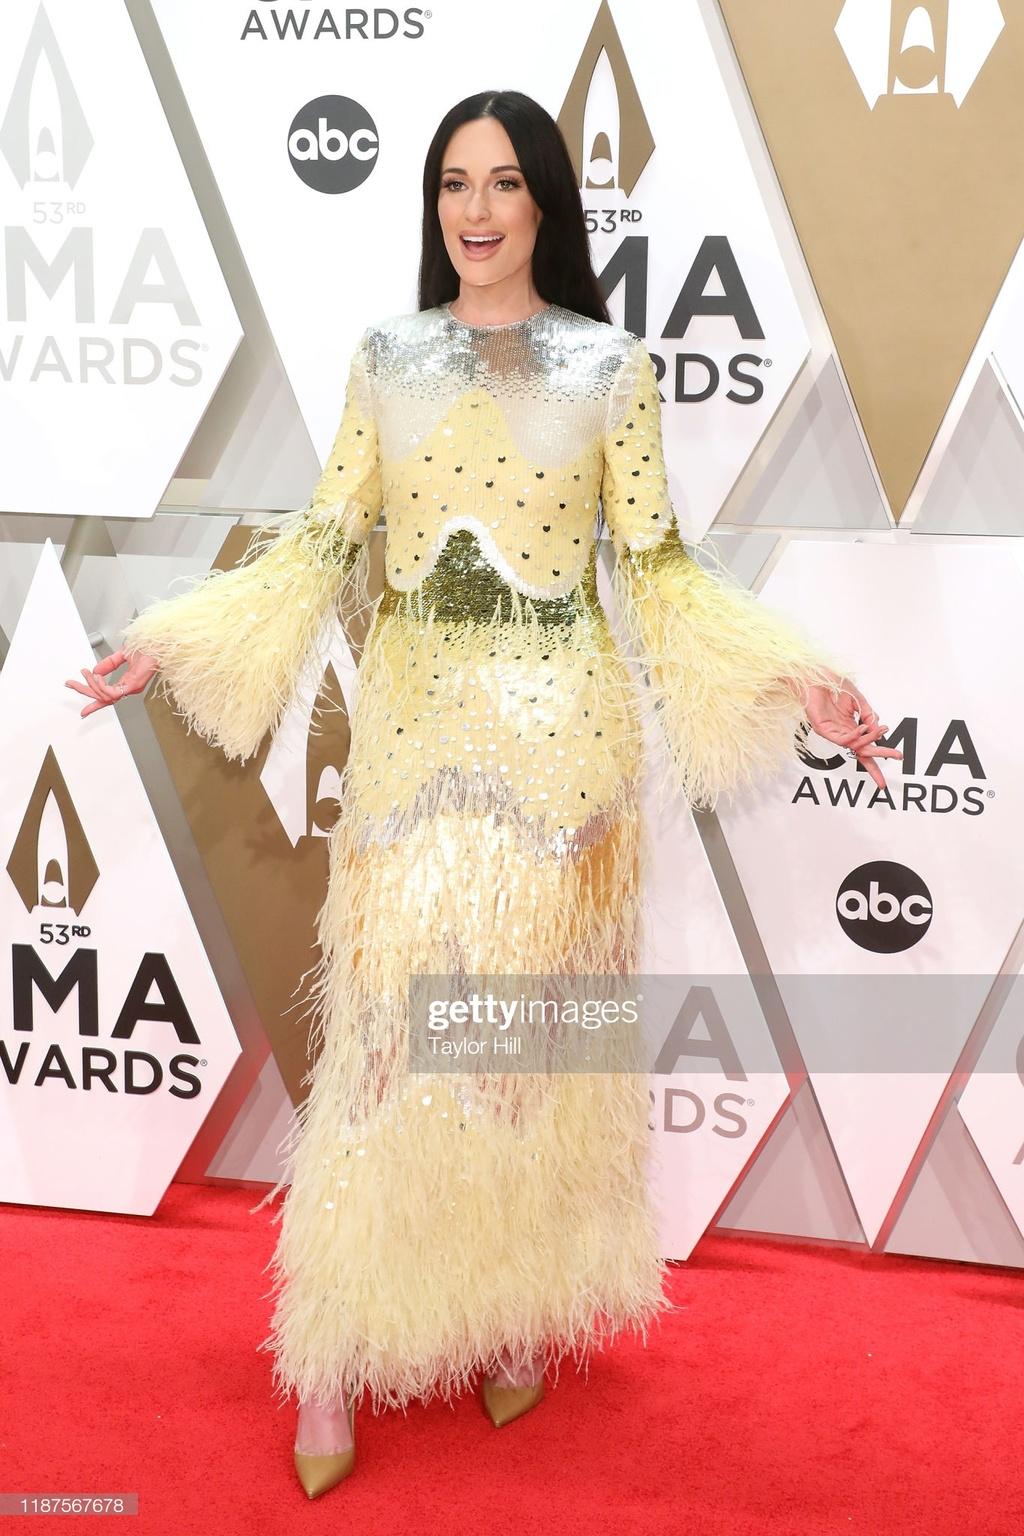 Nicole Kidman hon chong tre tren tham do hinh anh 6